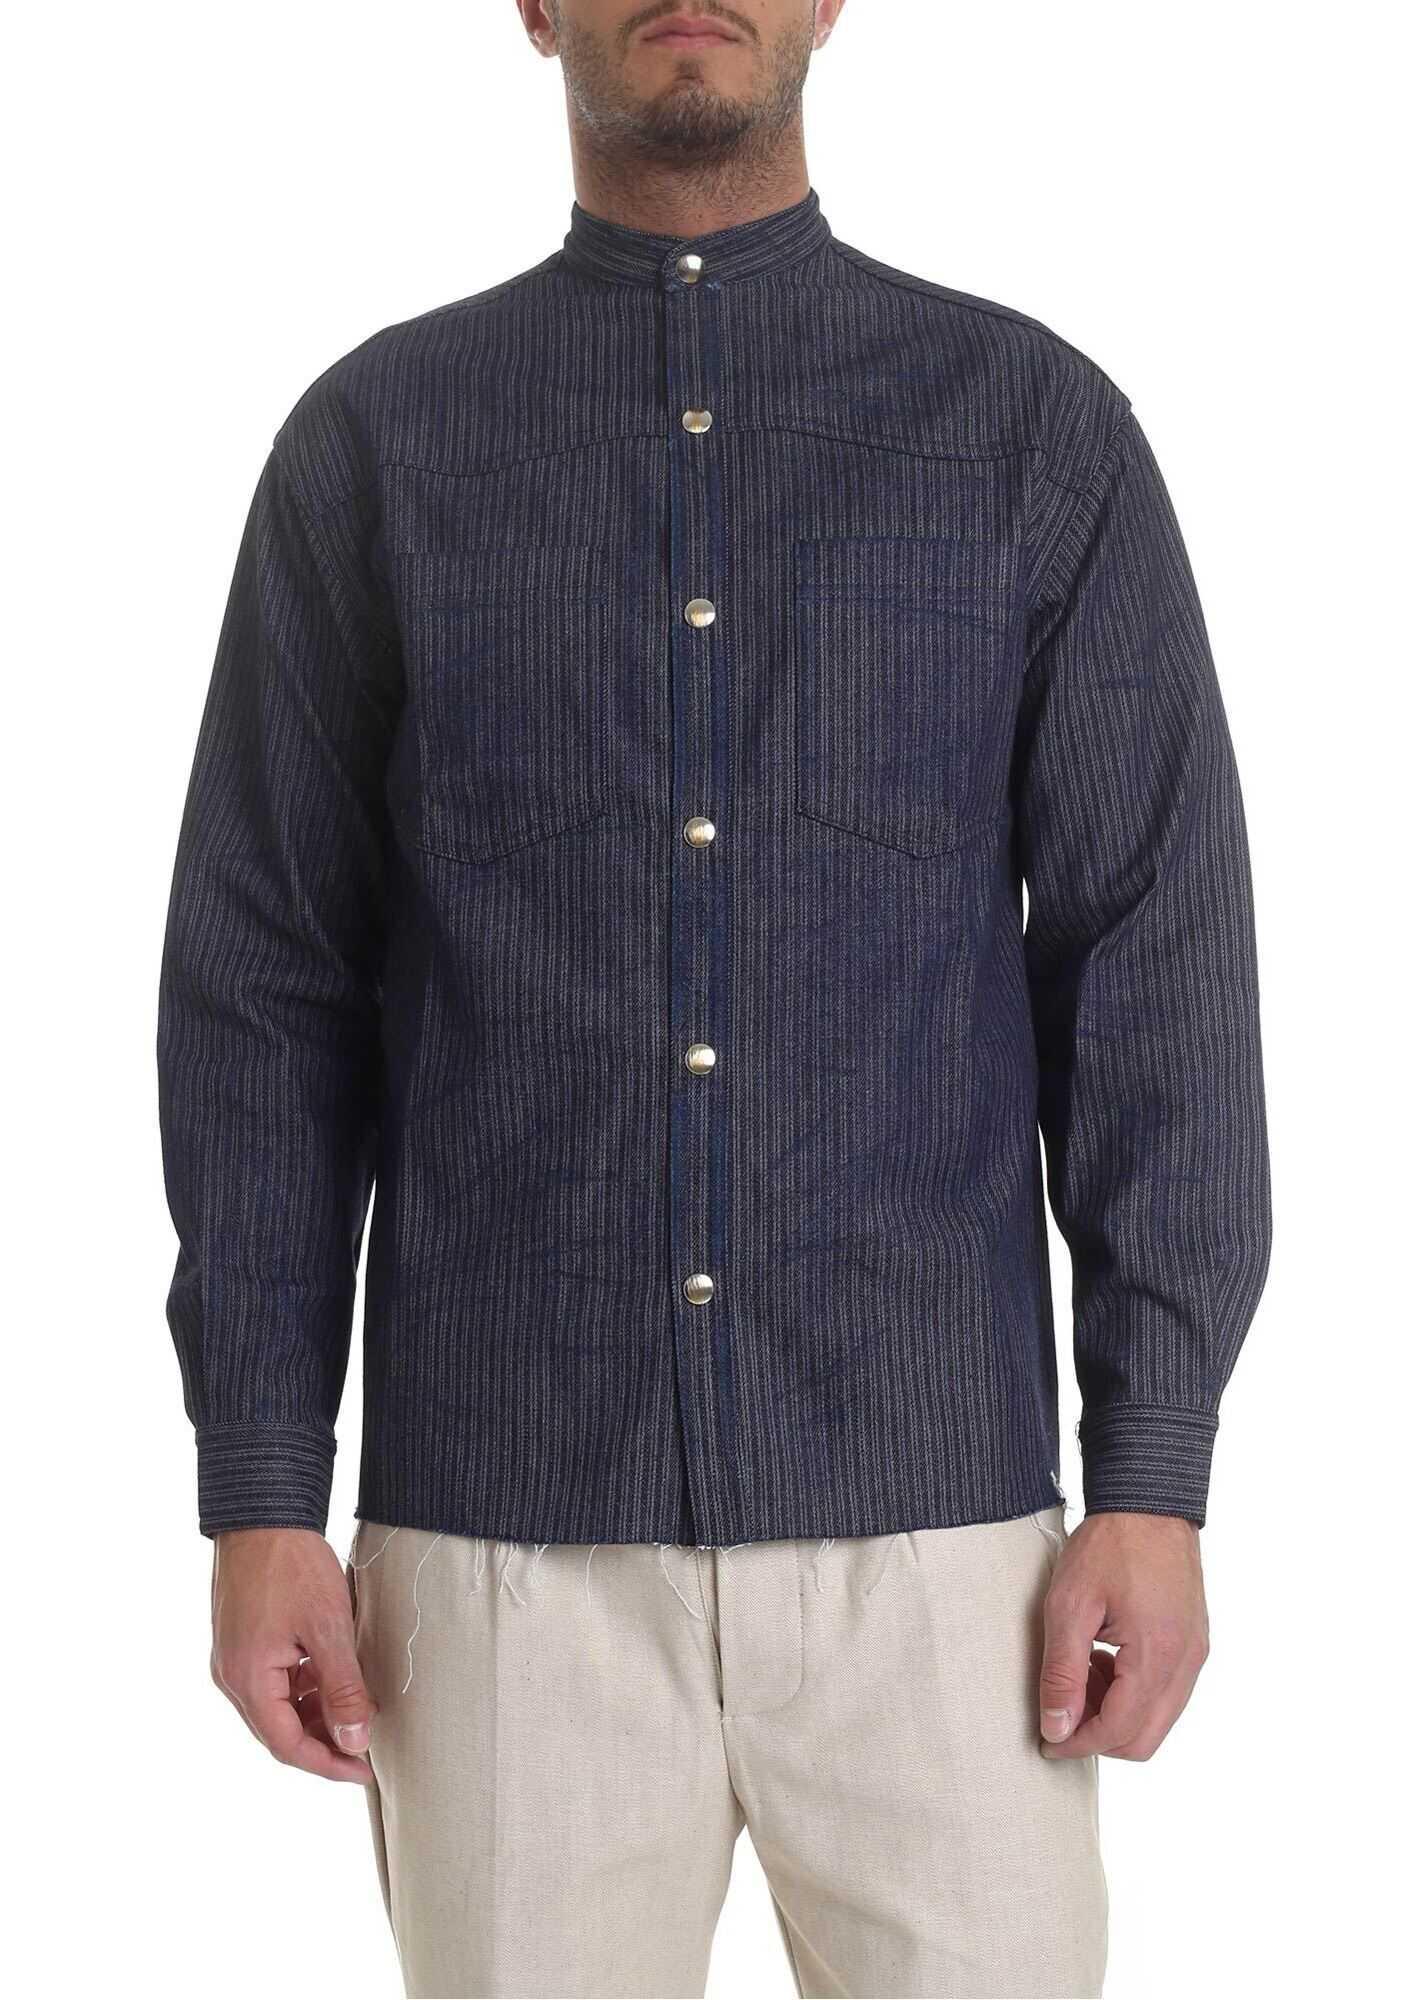 Ribbon Clothing Mandarin Collar Shirt In Blue With Stripes Blue imagine